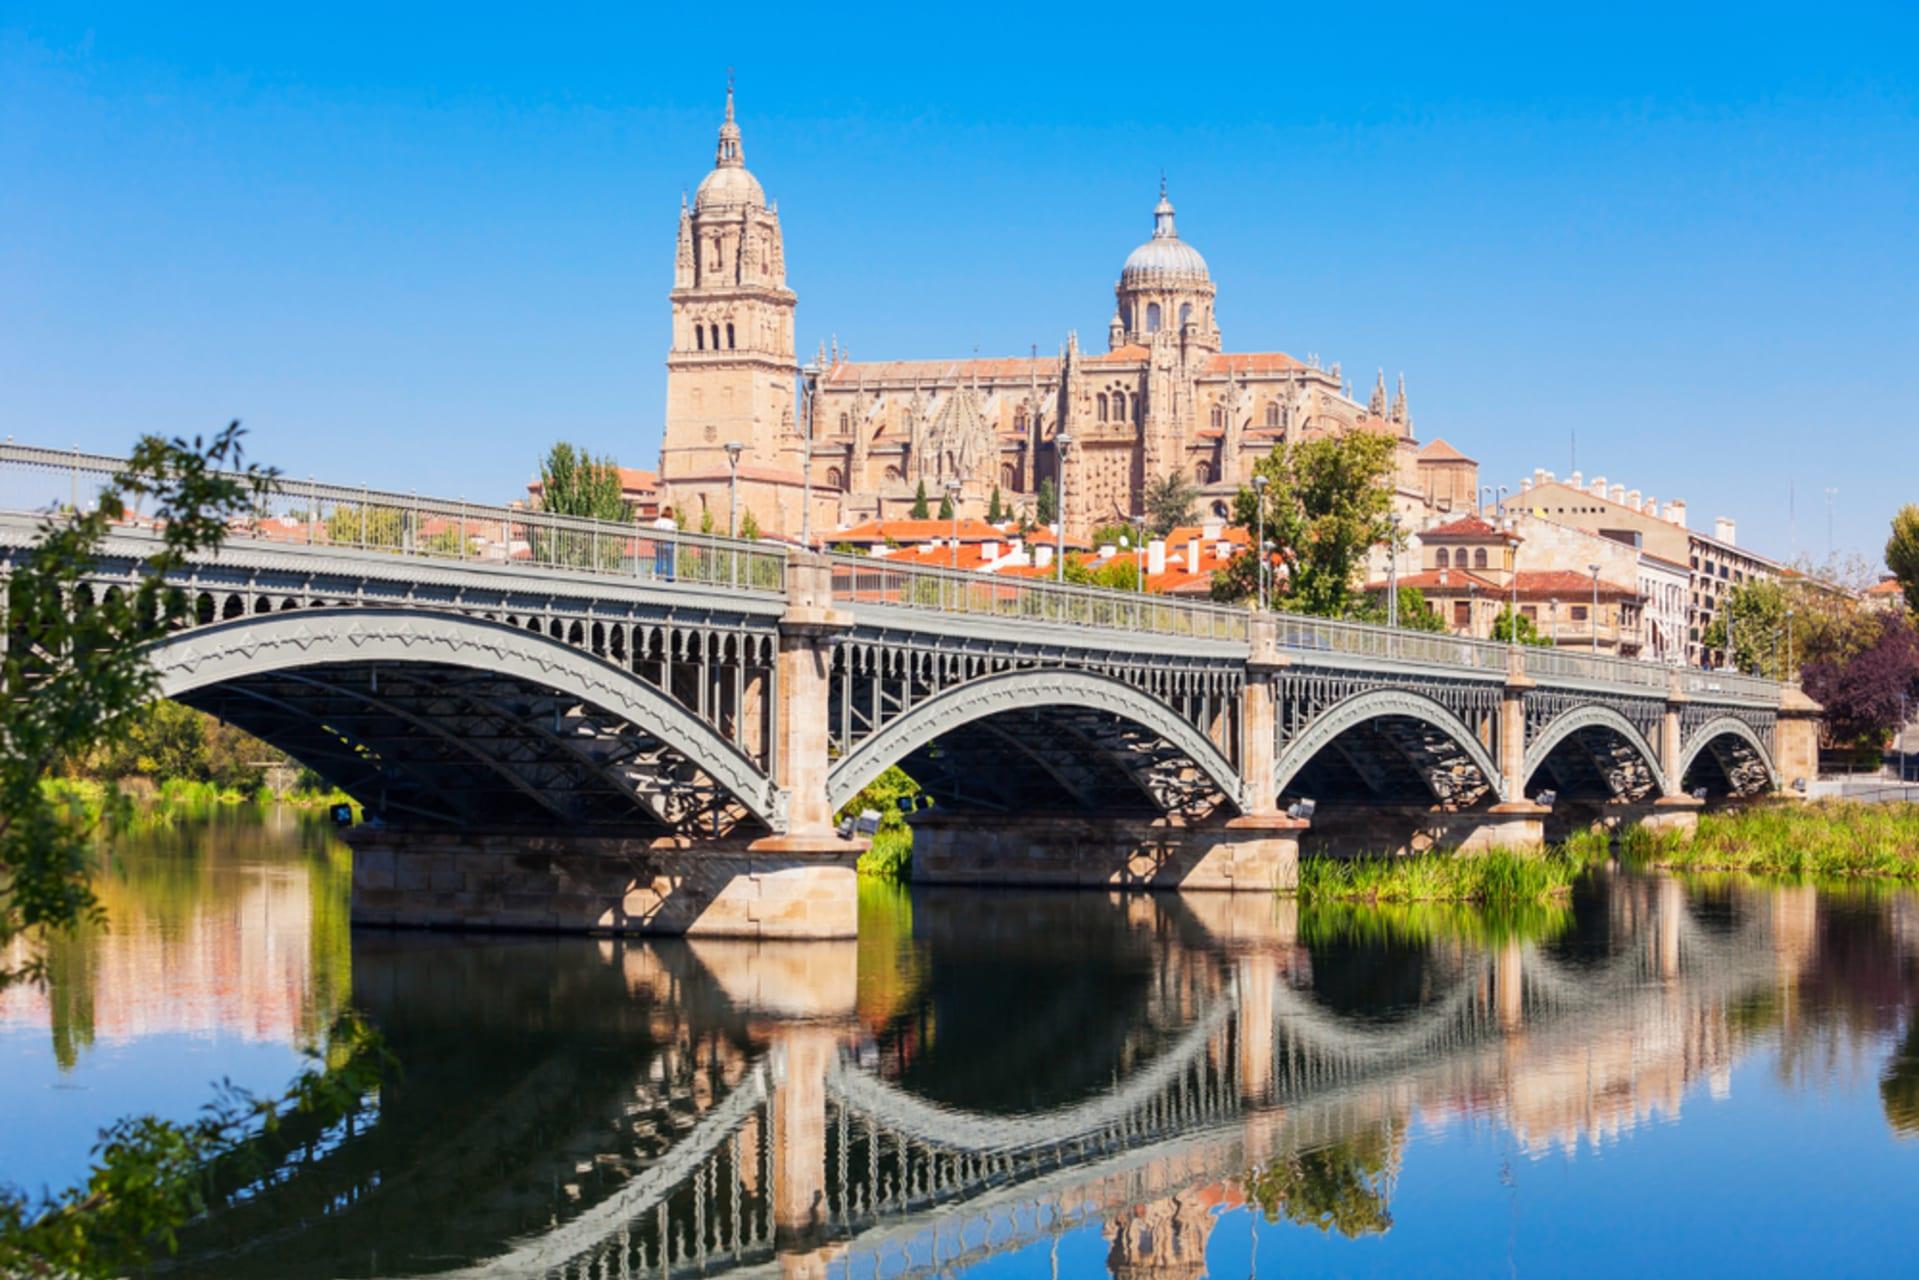 Salamanca - Highlights of Salamanca from Plaza Mayor to the Cathedral